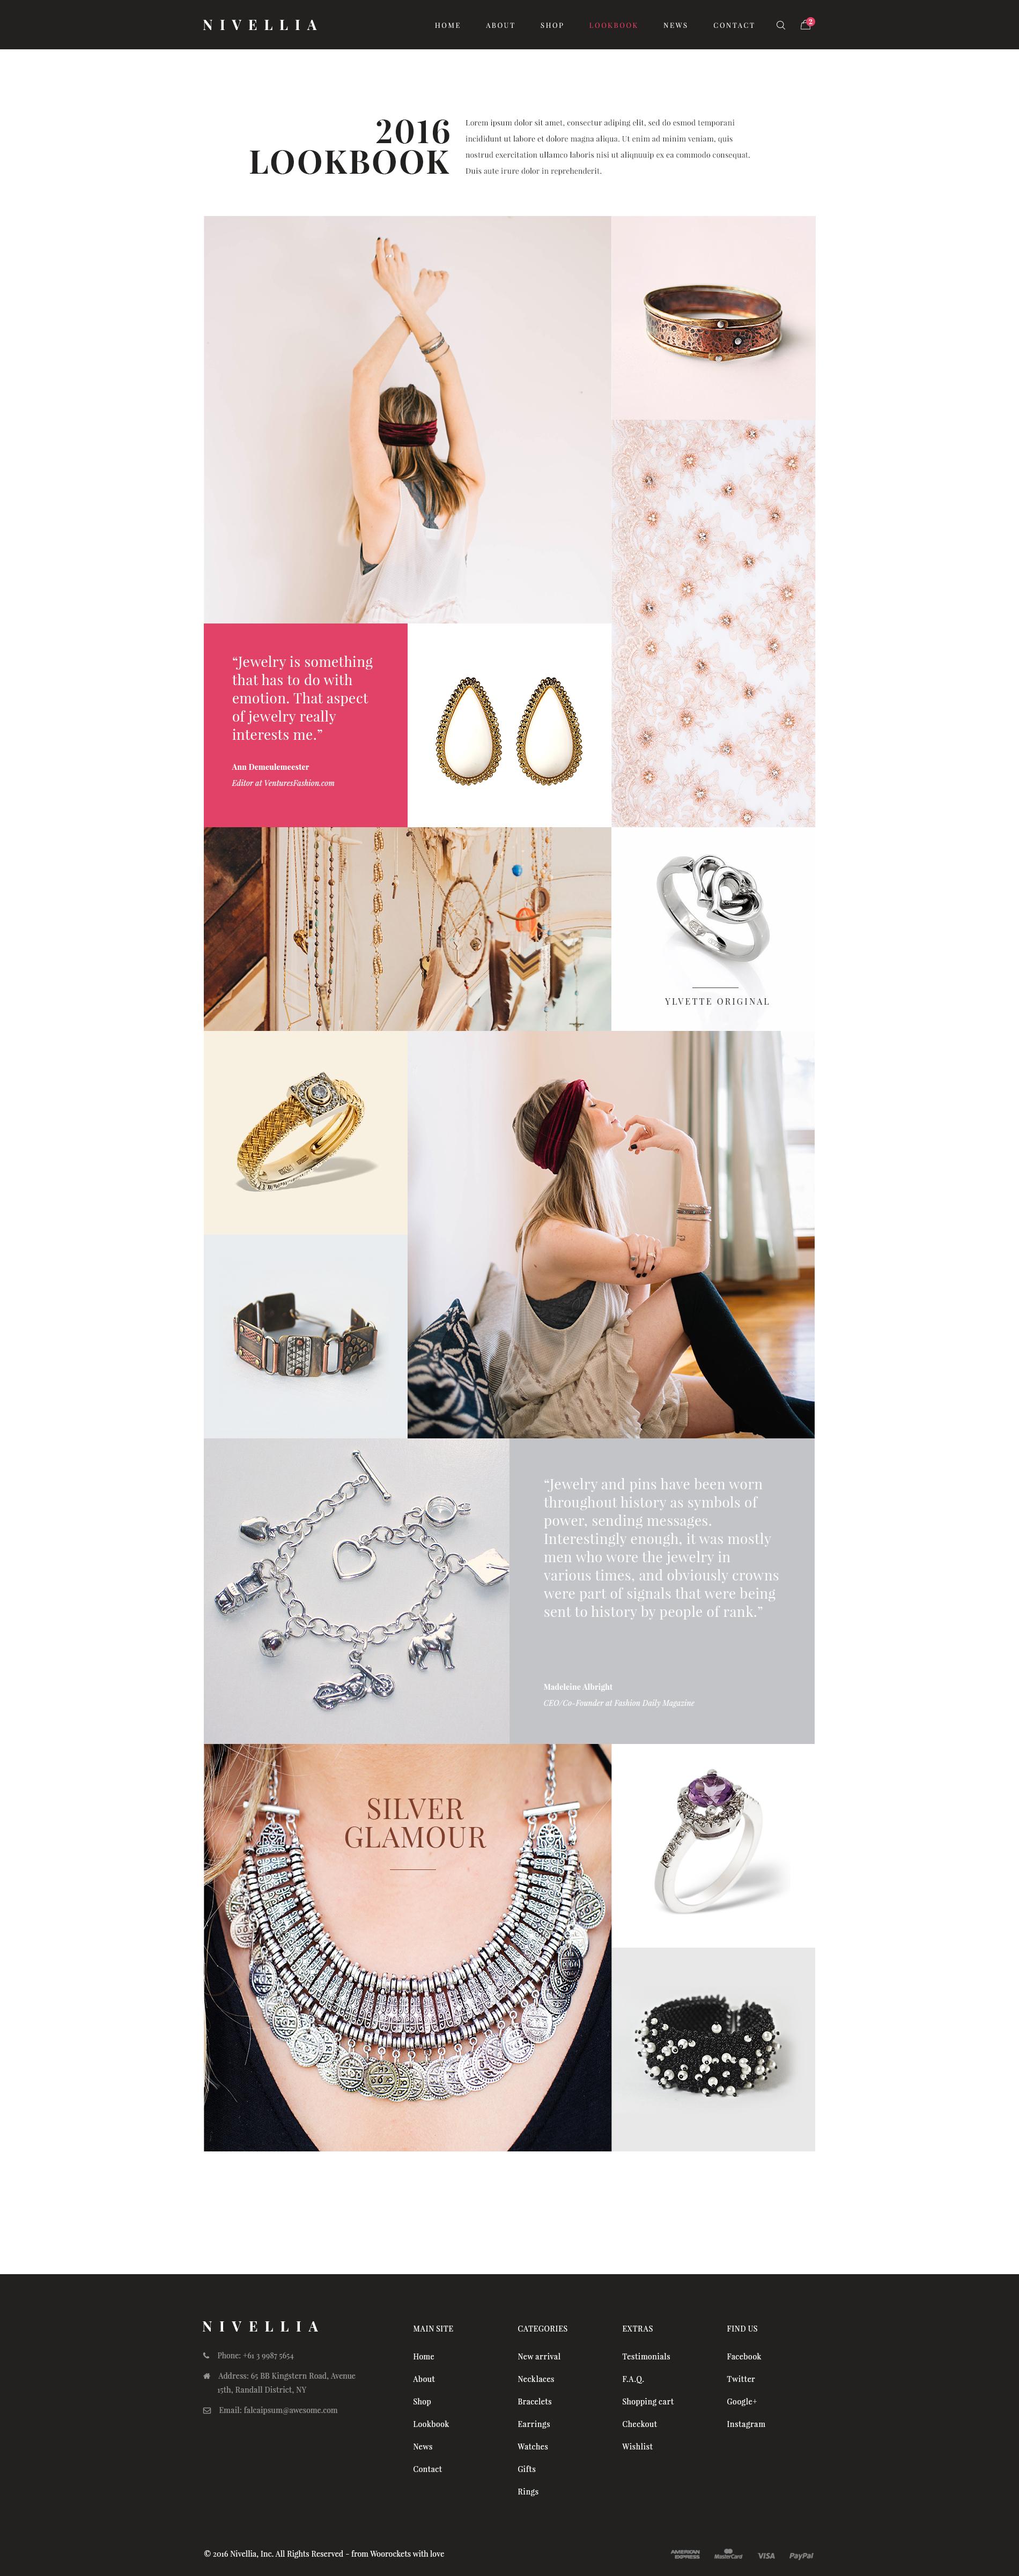 Nitro theme jewelry lookbook